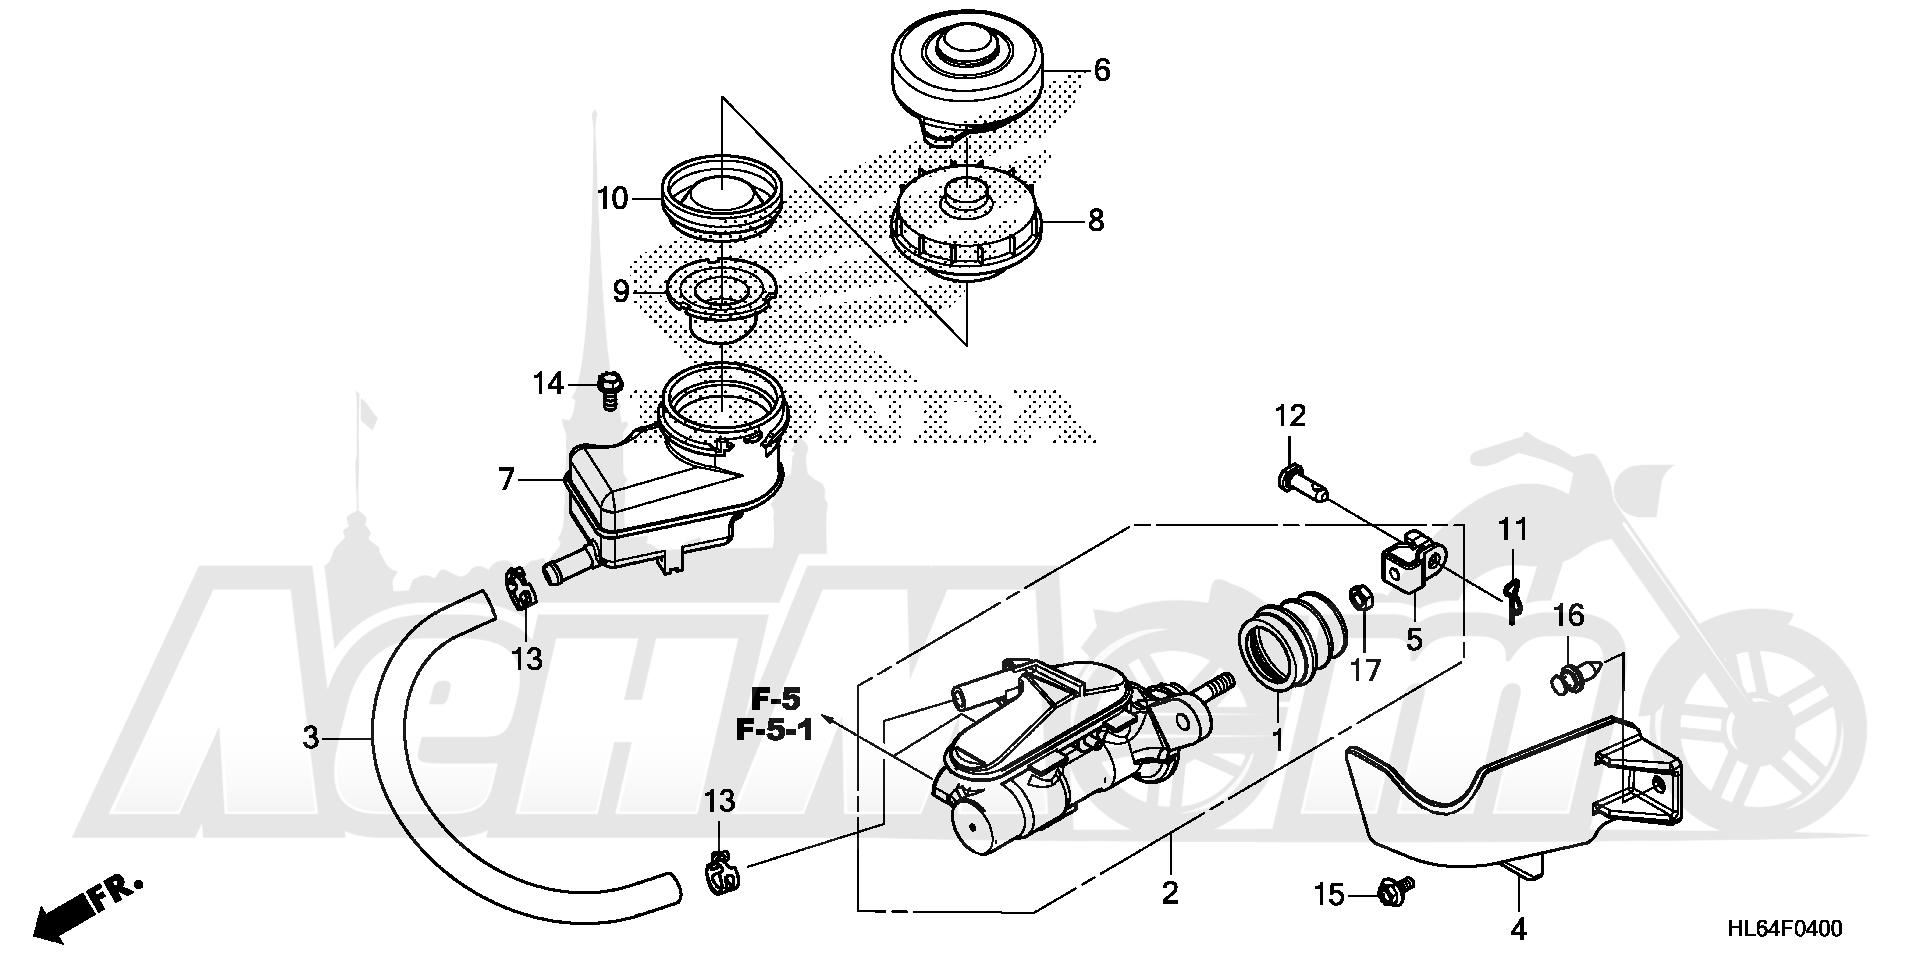 Запчасти для Квадроцикла Honda 2019 SXS1000S2X Раздел: BRAKE MASTER CYLINDER | тормоза главный цилиндр